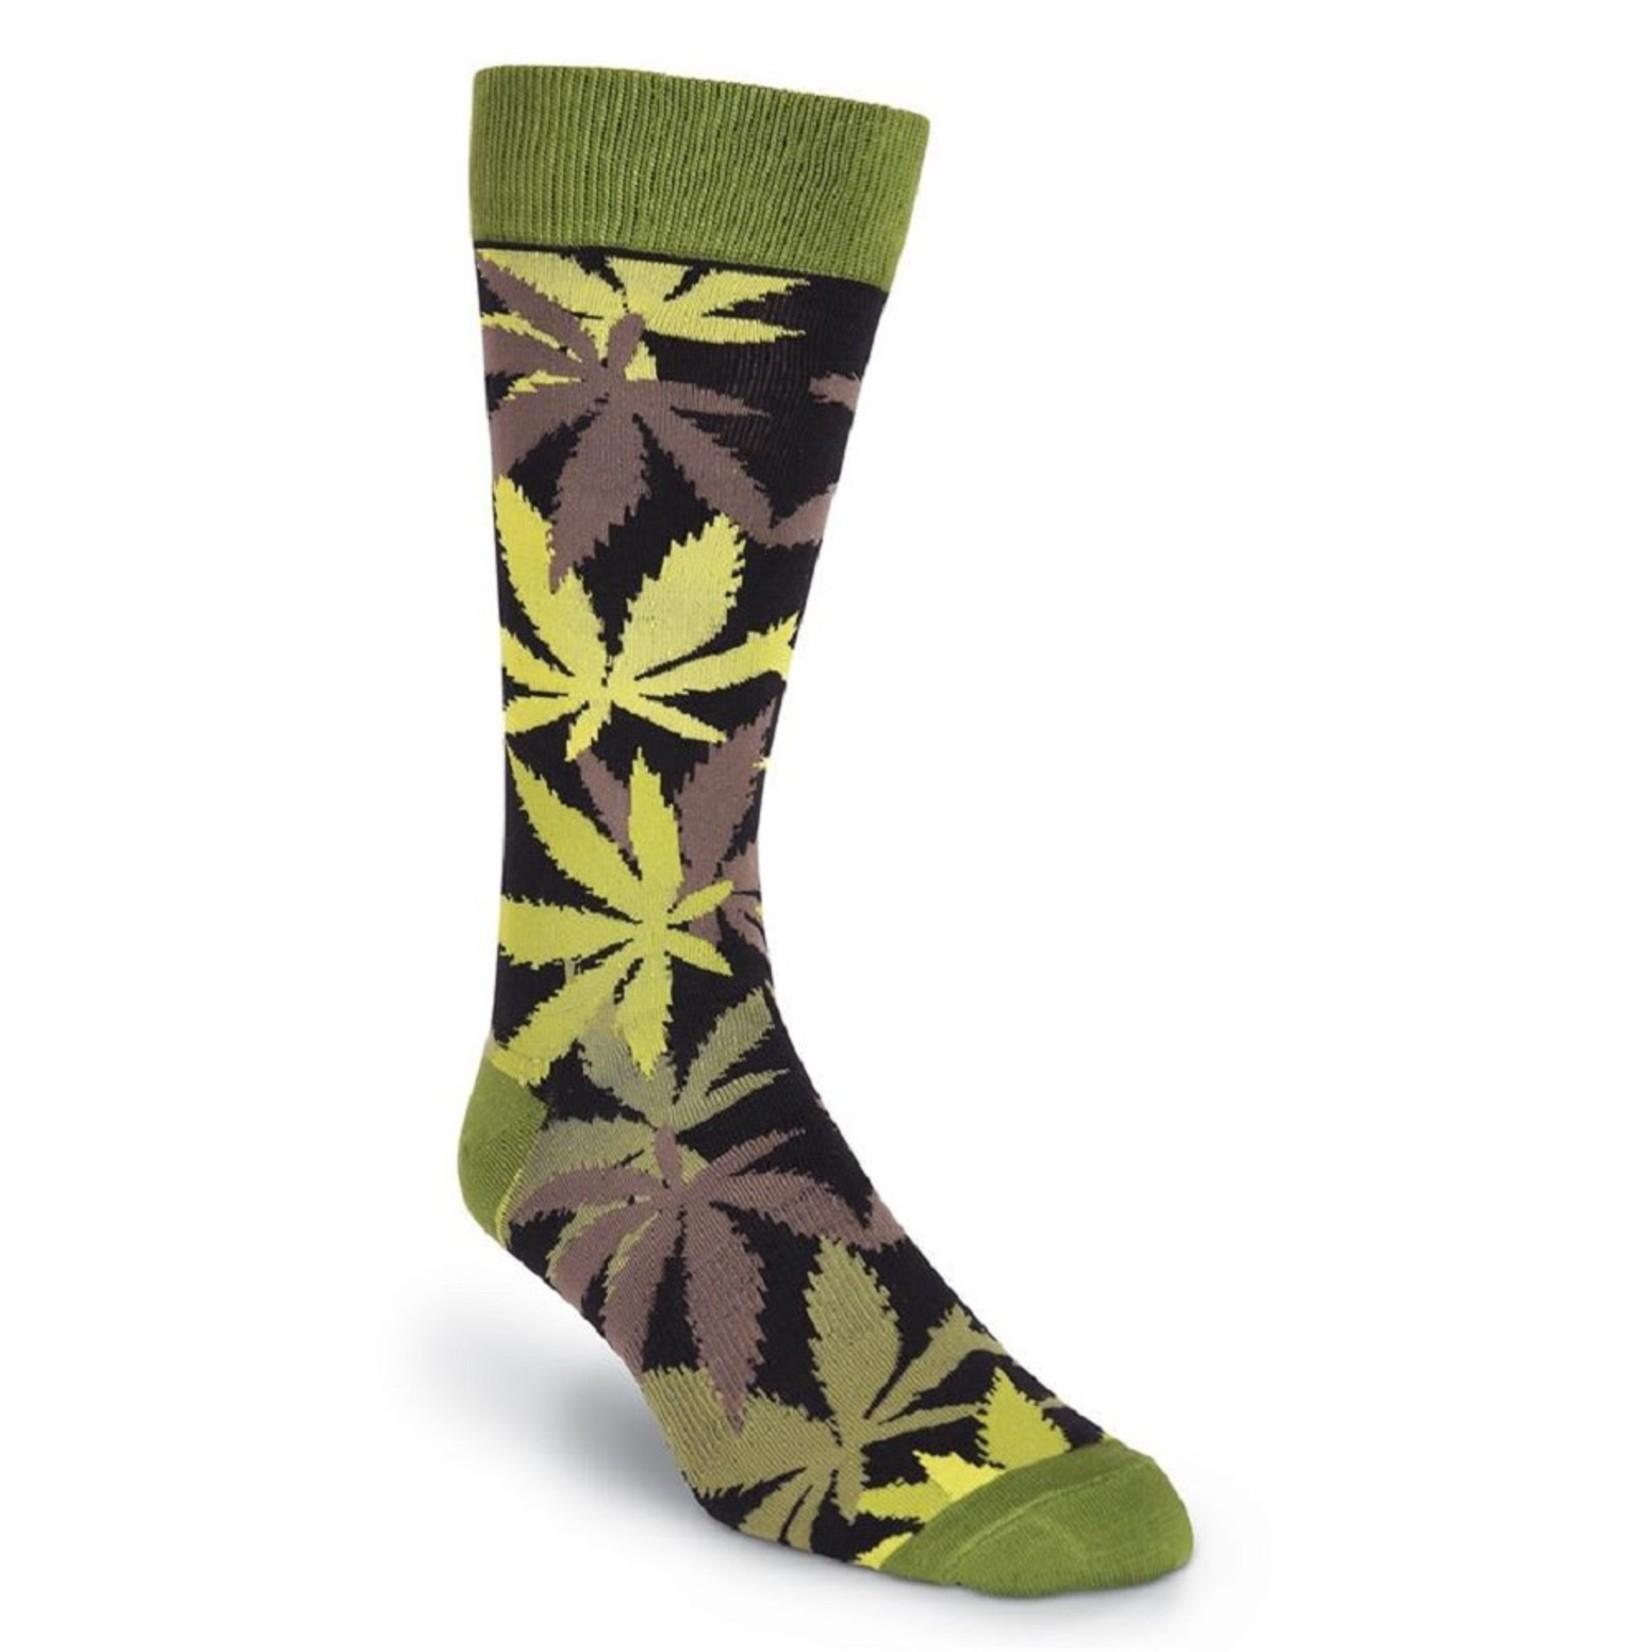 Socks (Mens) - Pot Luck - Pot Leaf